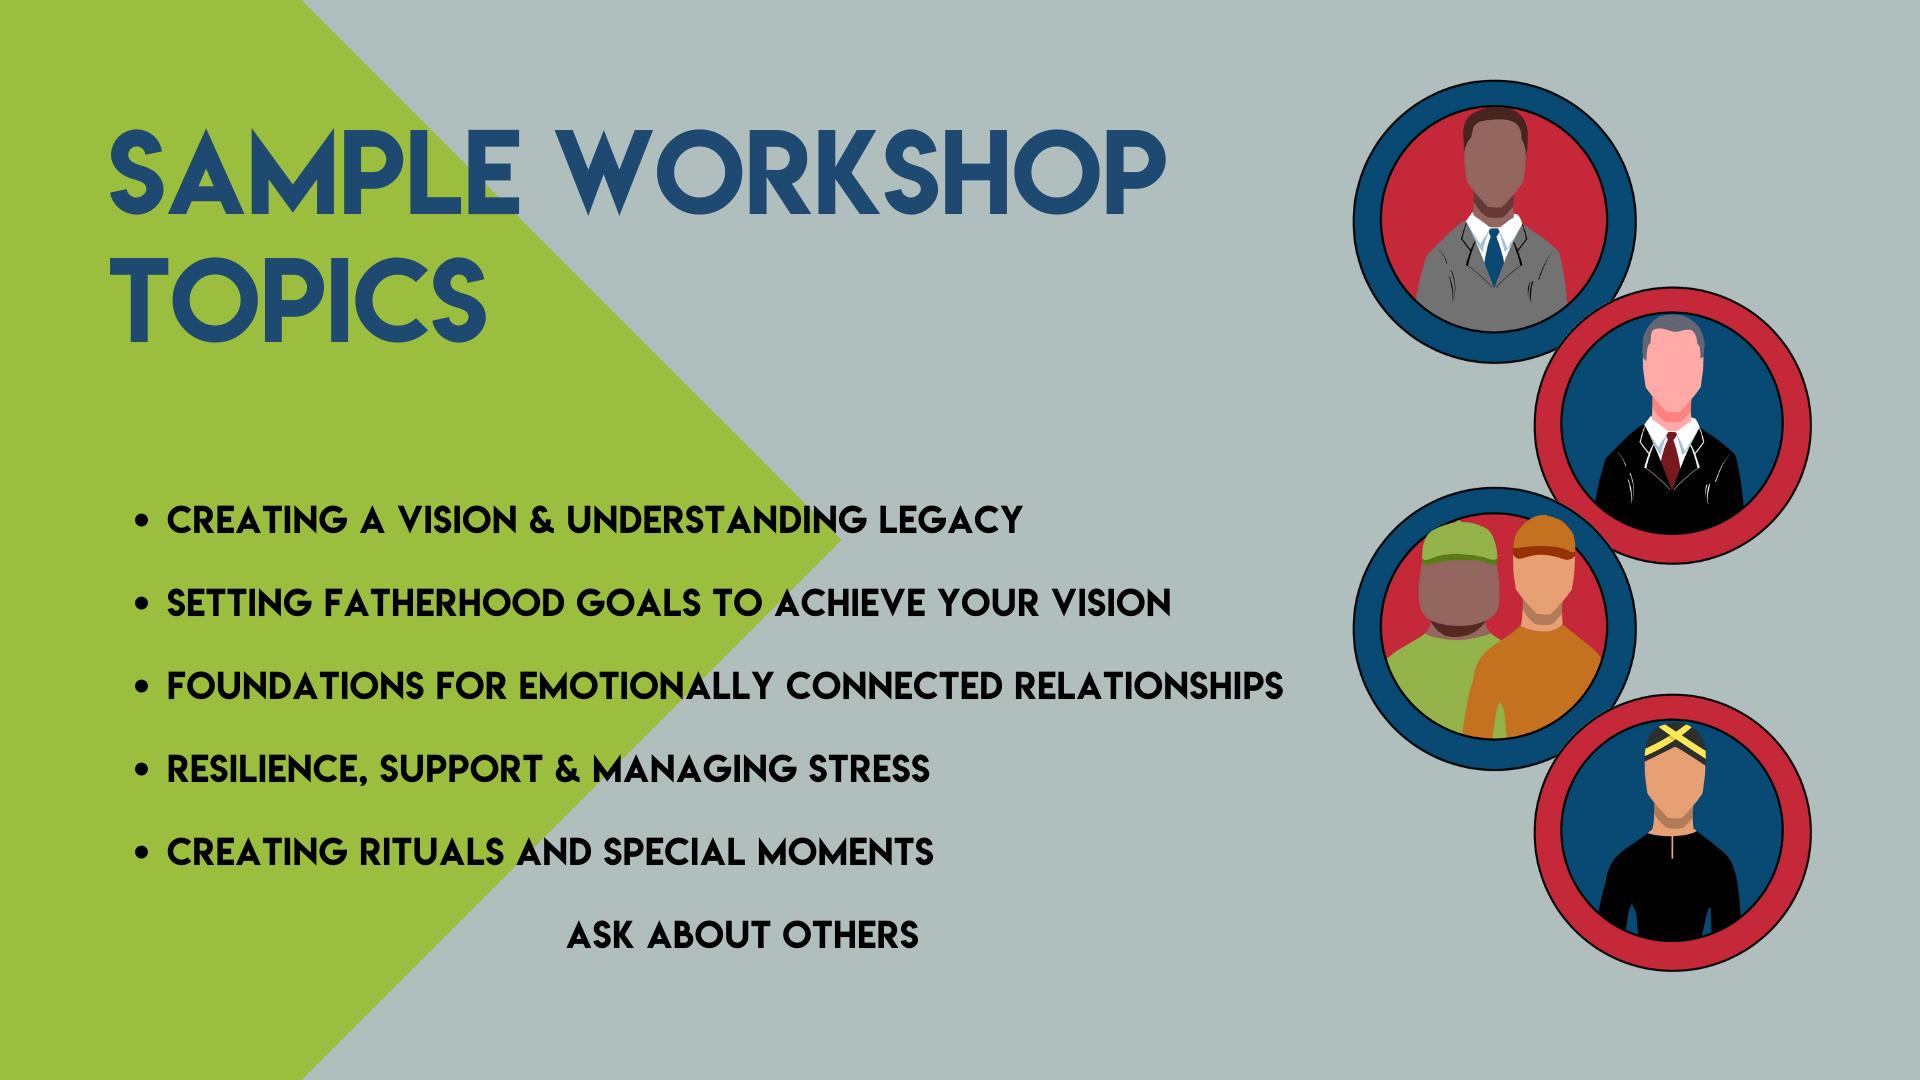 Sample Workshop Topics